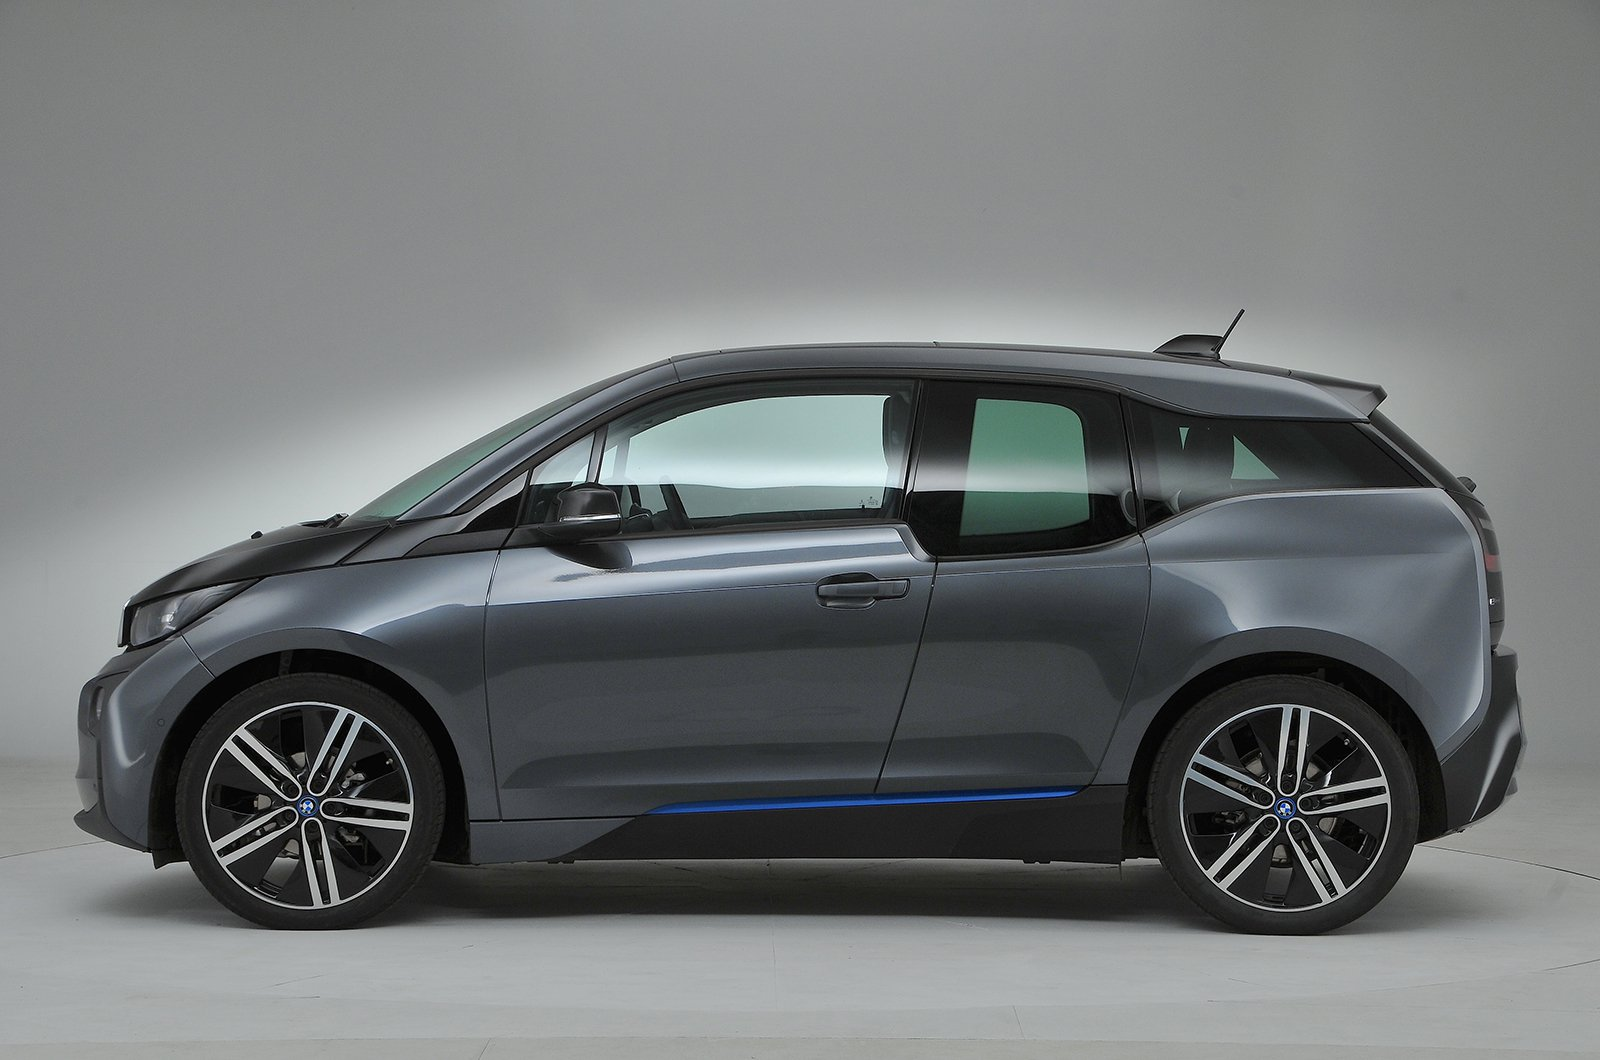 Used test: BMW i3 vs Volkswagen e-Golf